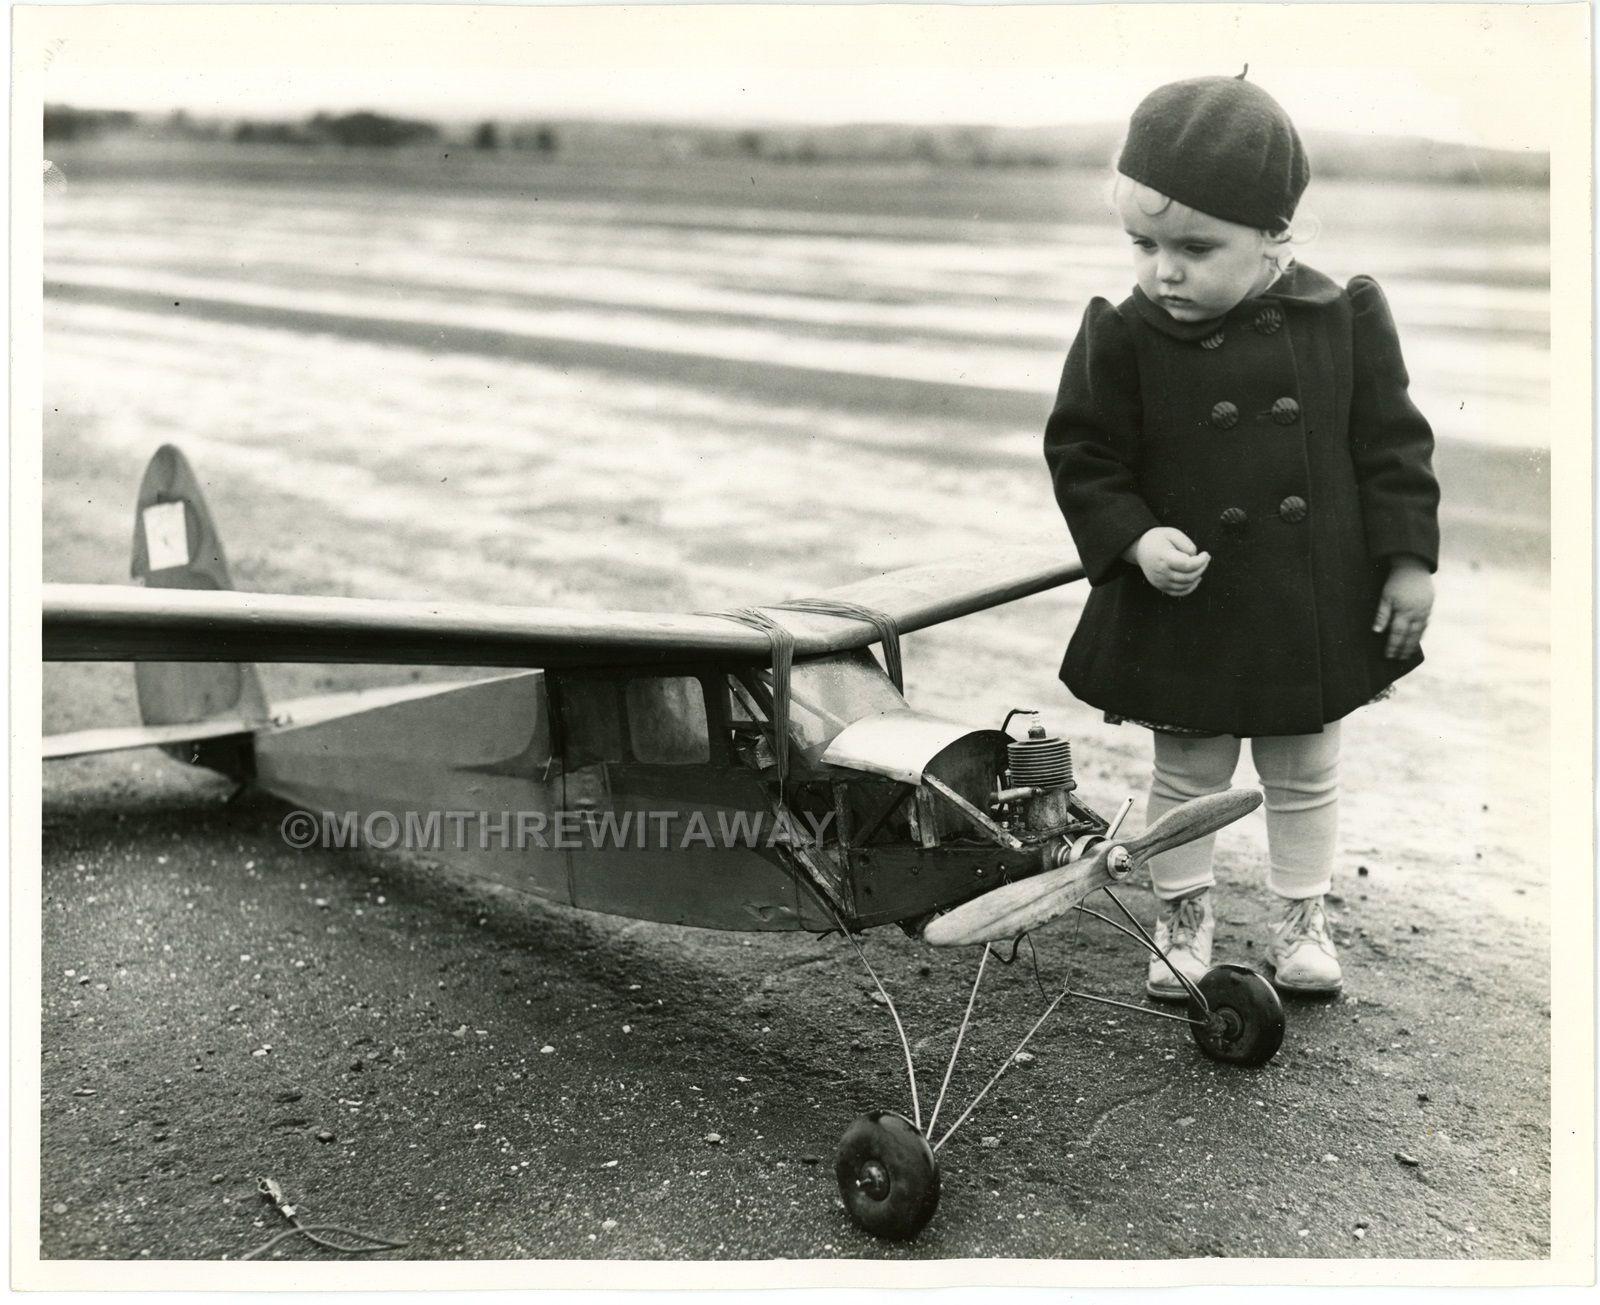 Military Aircraft of 1919-1930. Early Warplanes